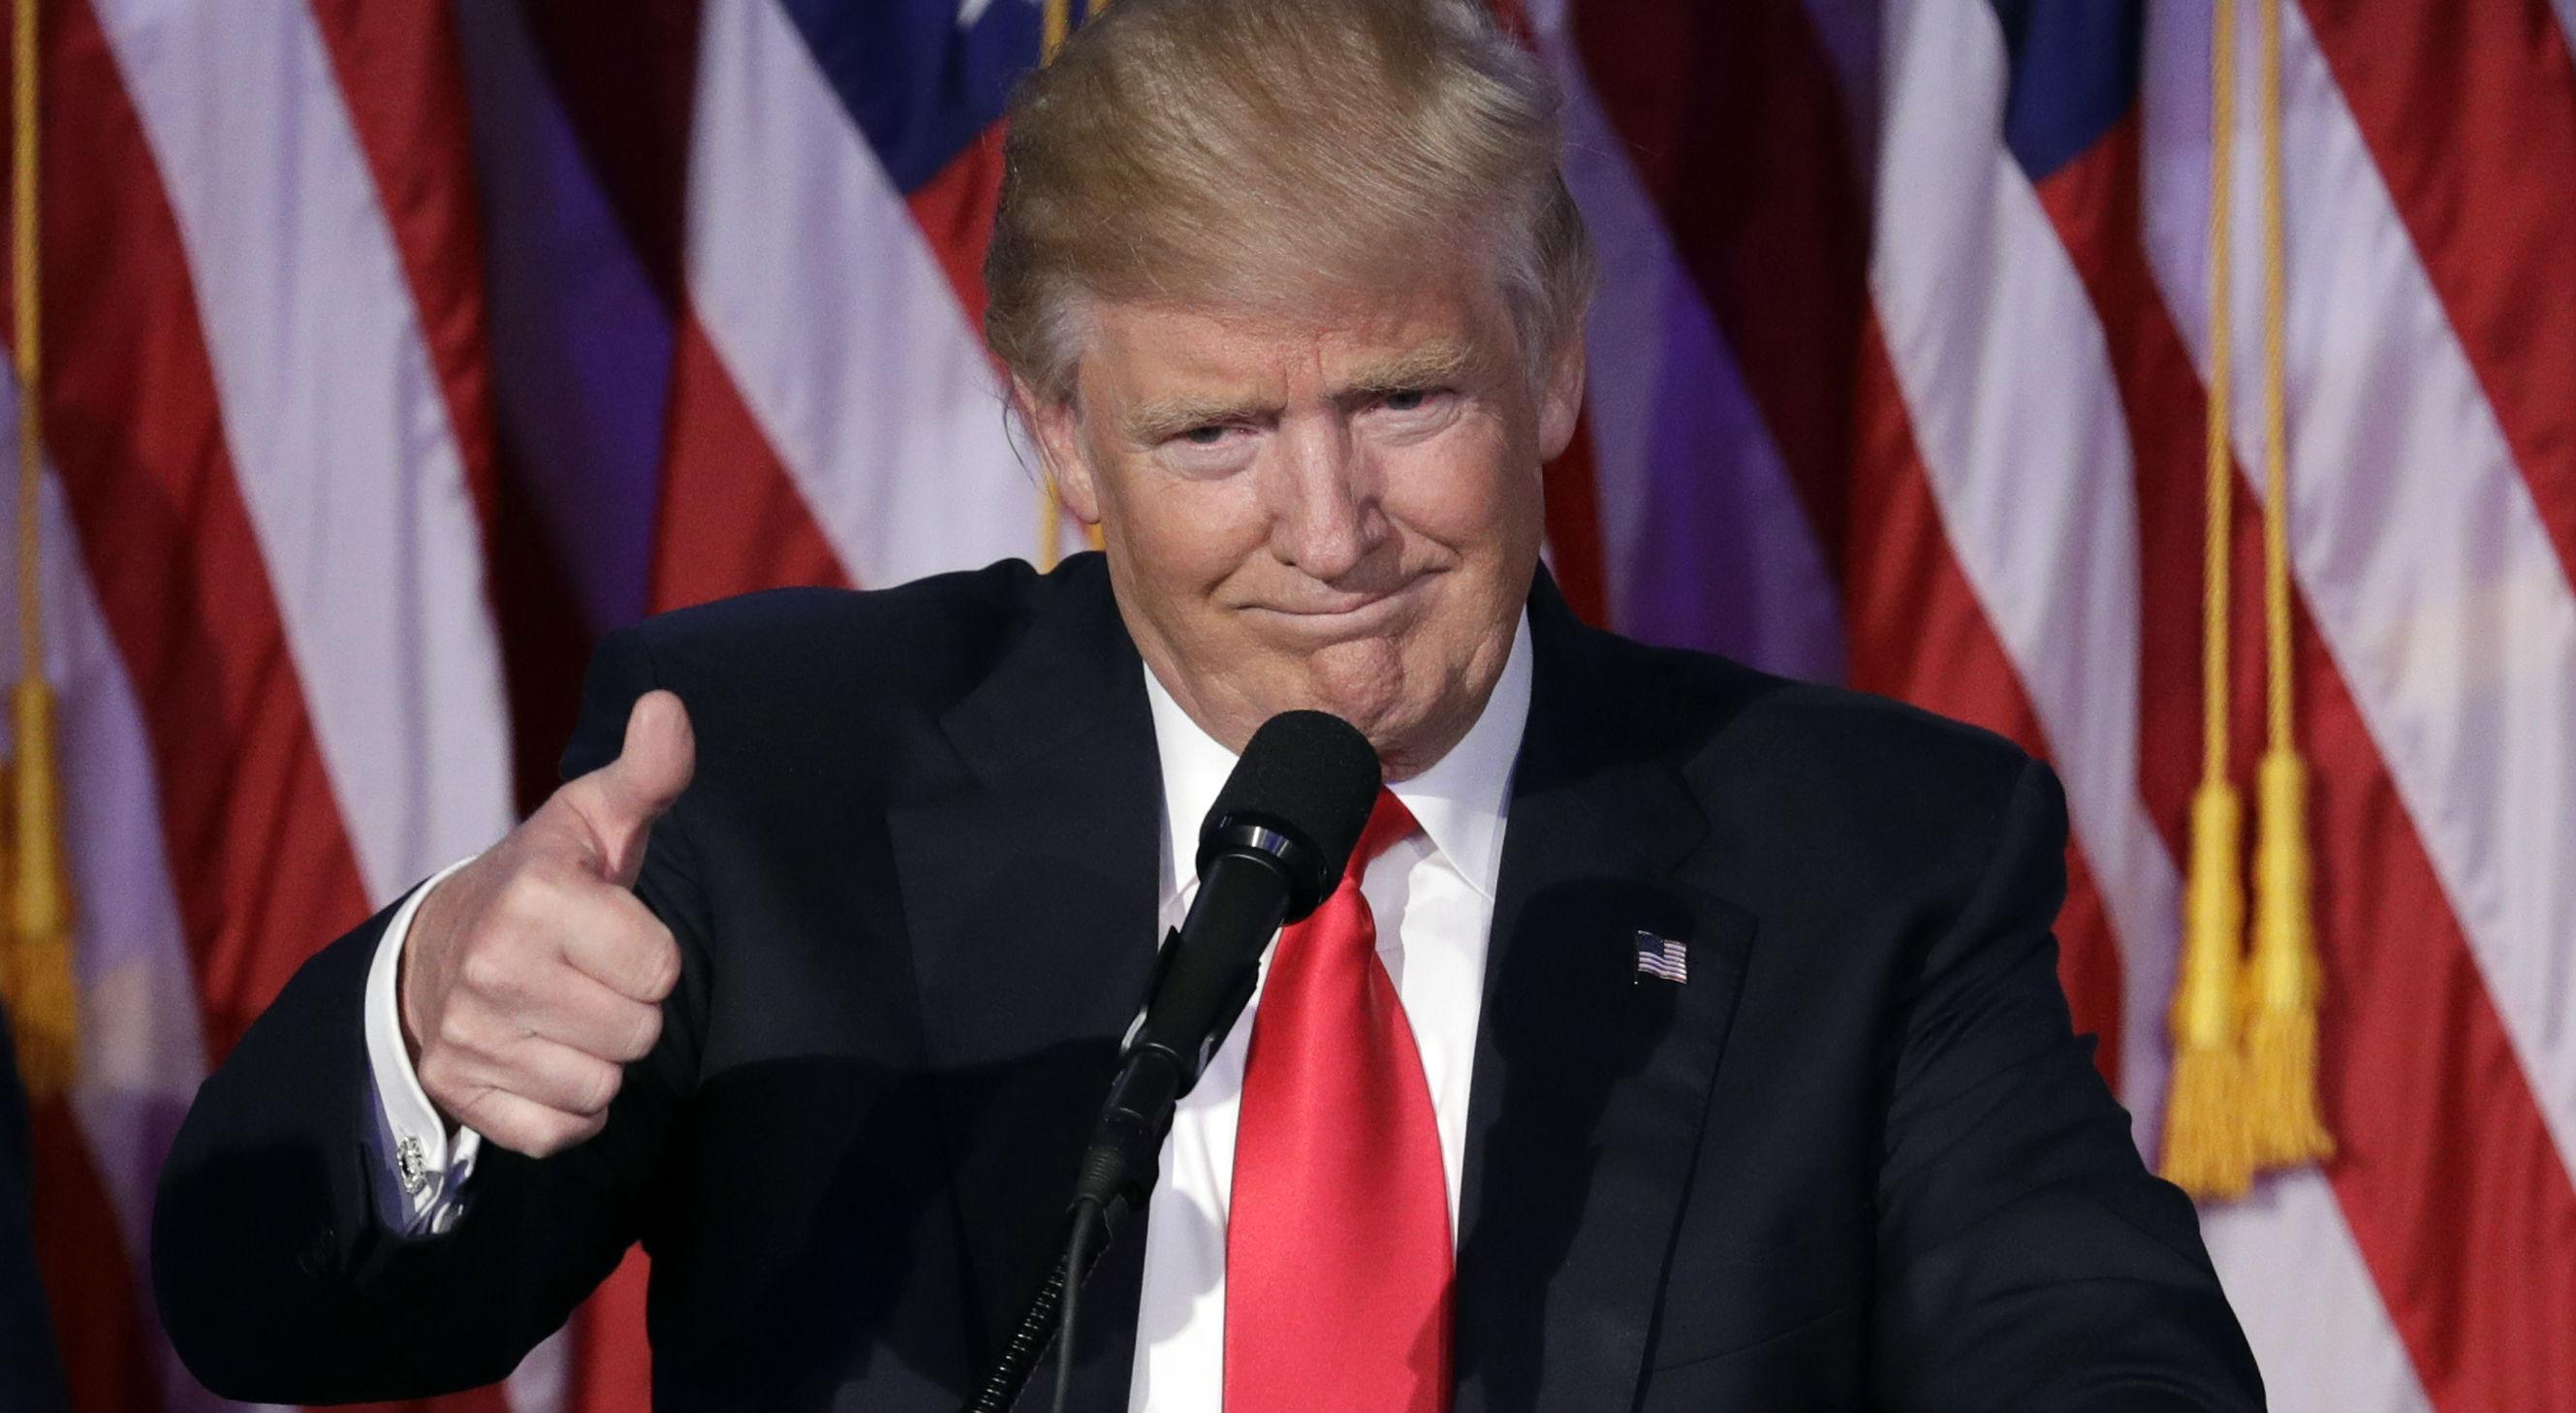 47 Brutales Frases De Donald Trump Para Tener éxito En El